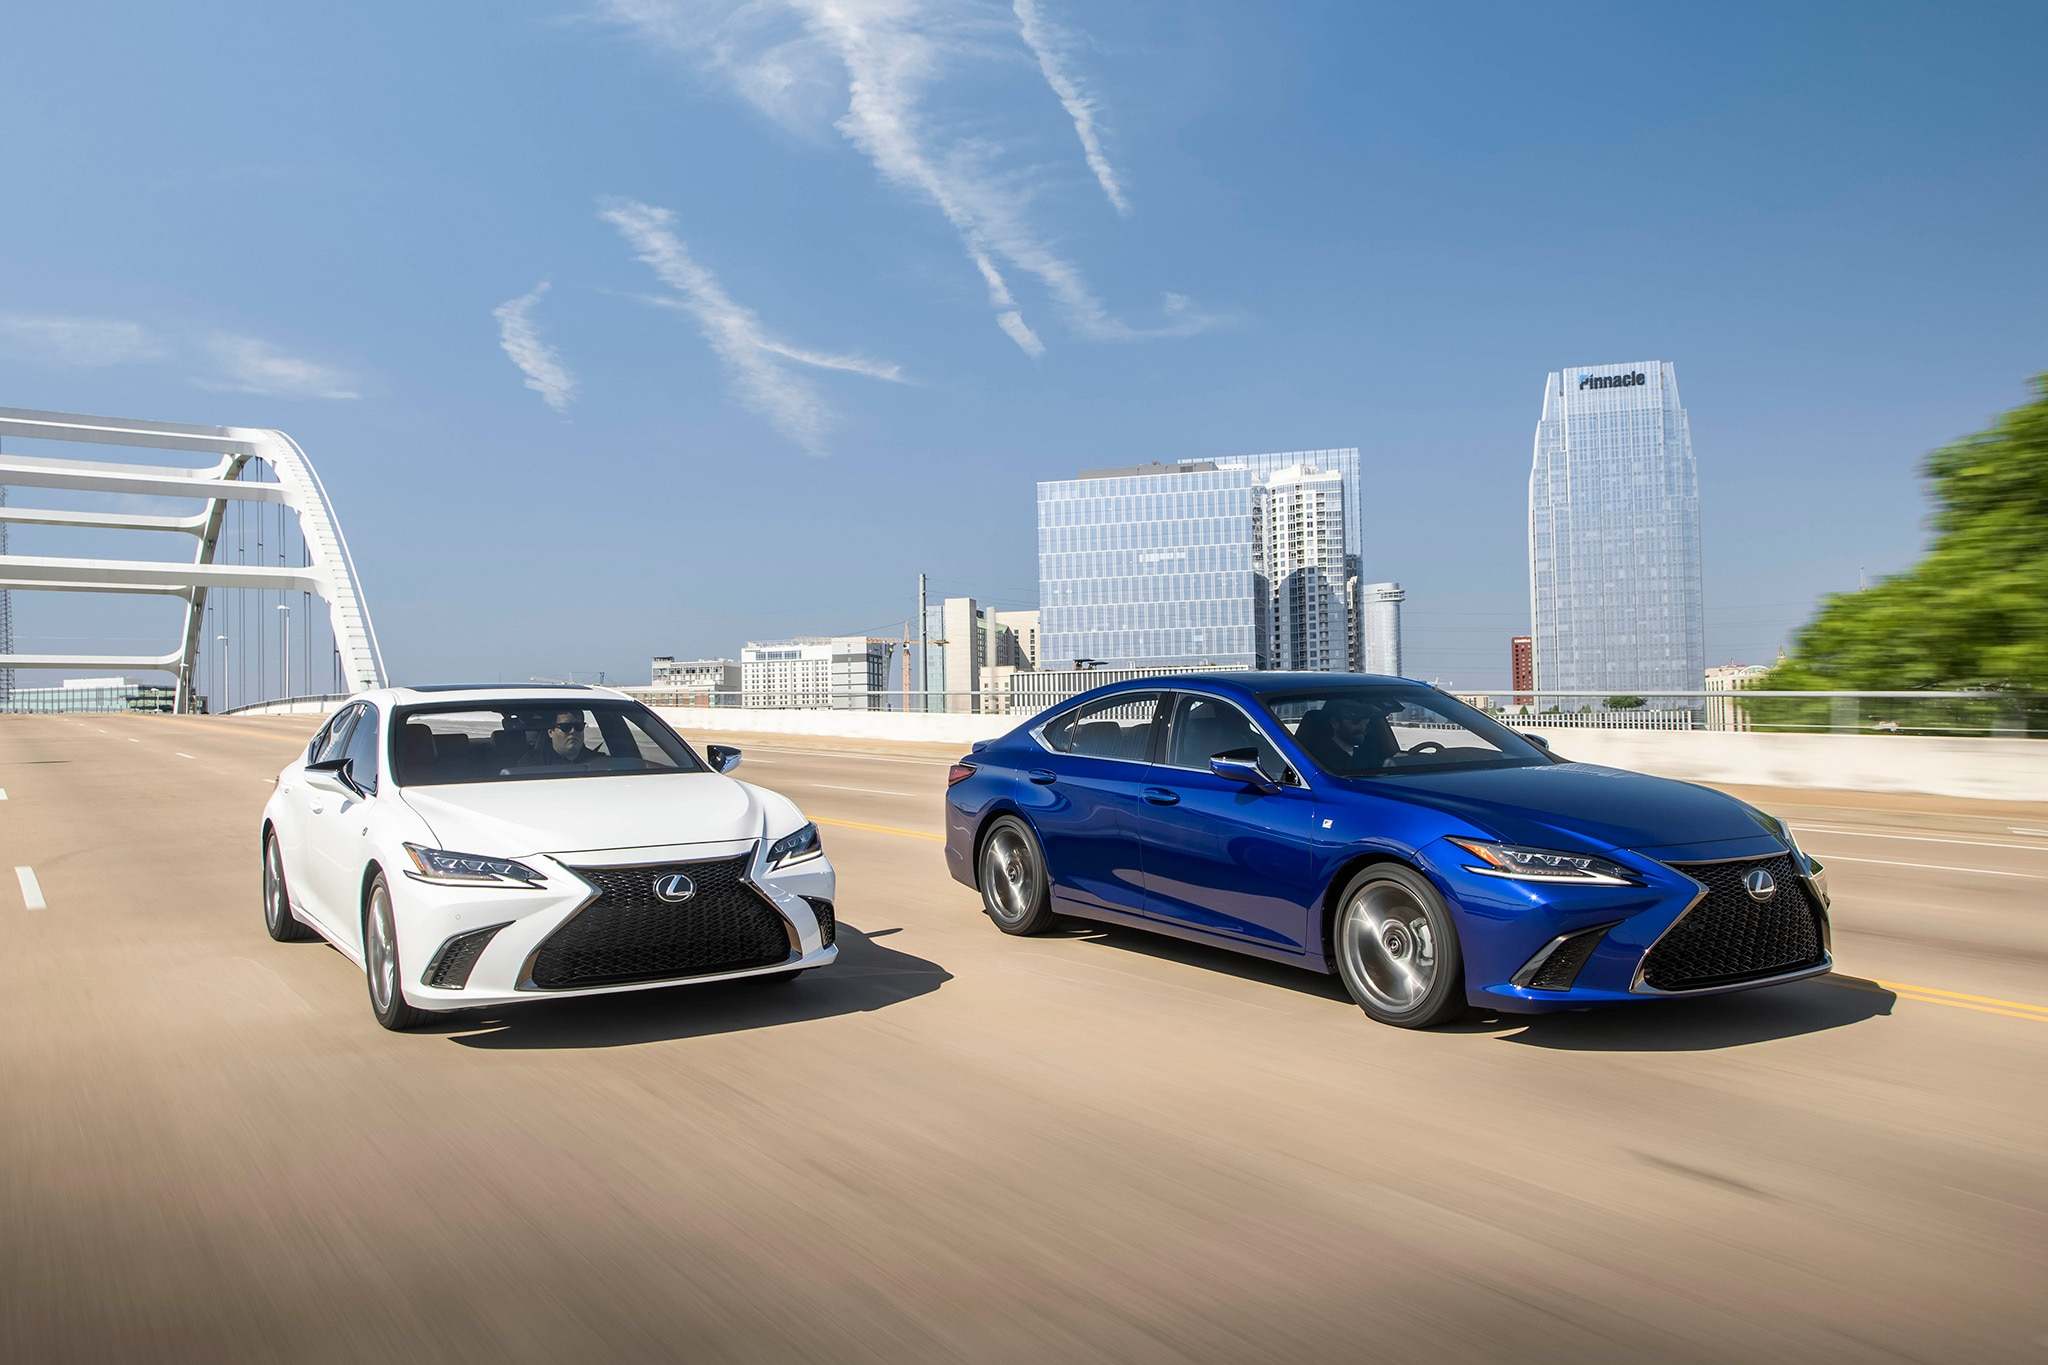 GALLERY: 2019 Lexus ES 350 F-Sport   Automobile Magazine